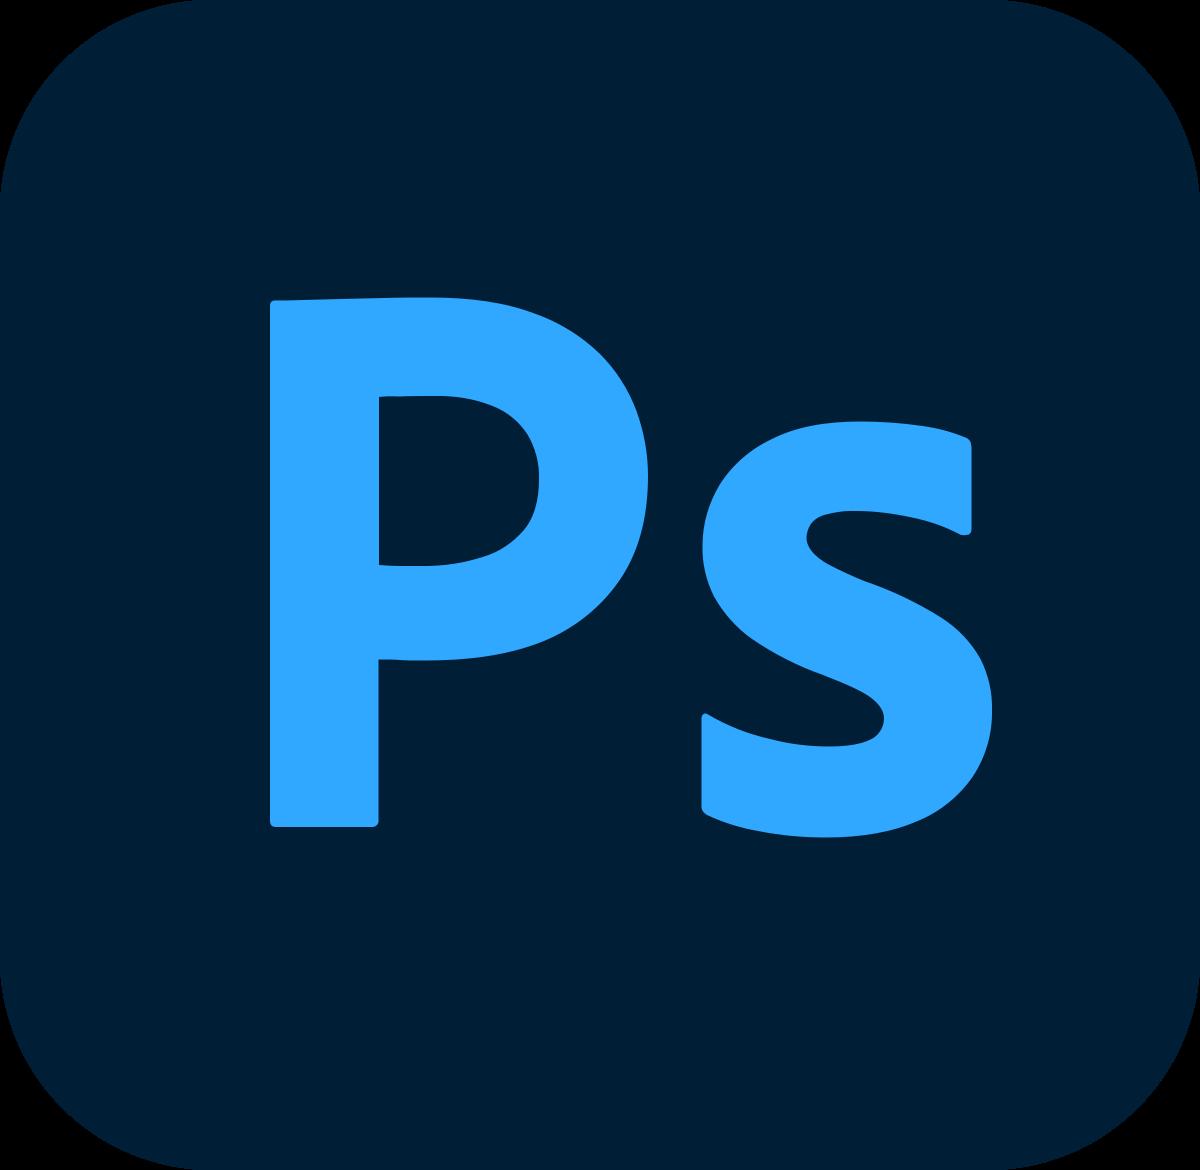 Adobe_Photoshop_CC